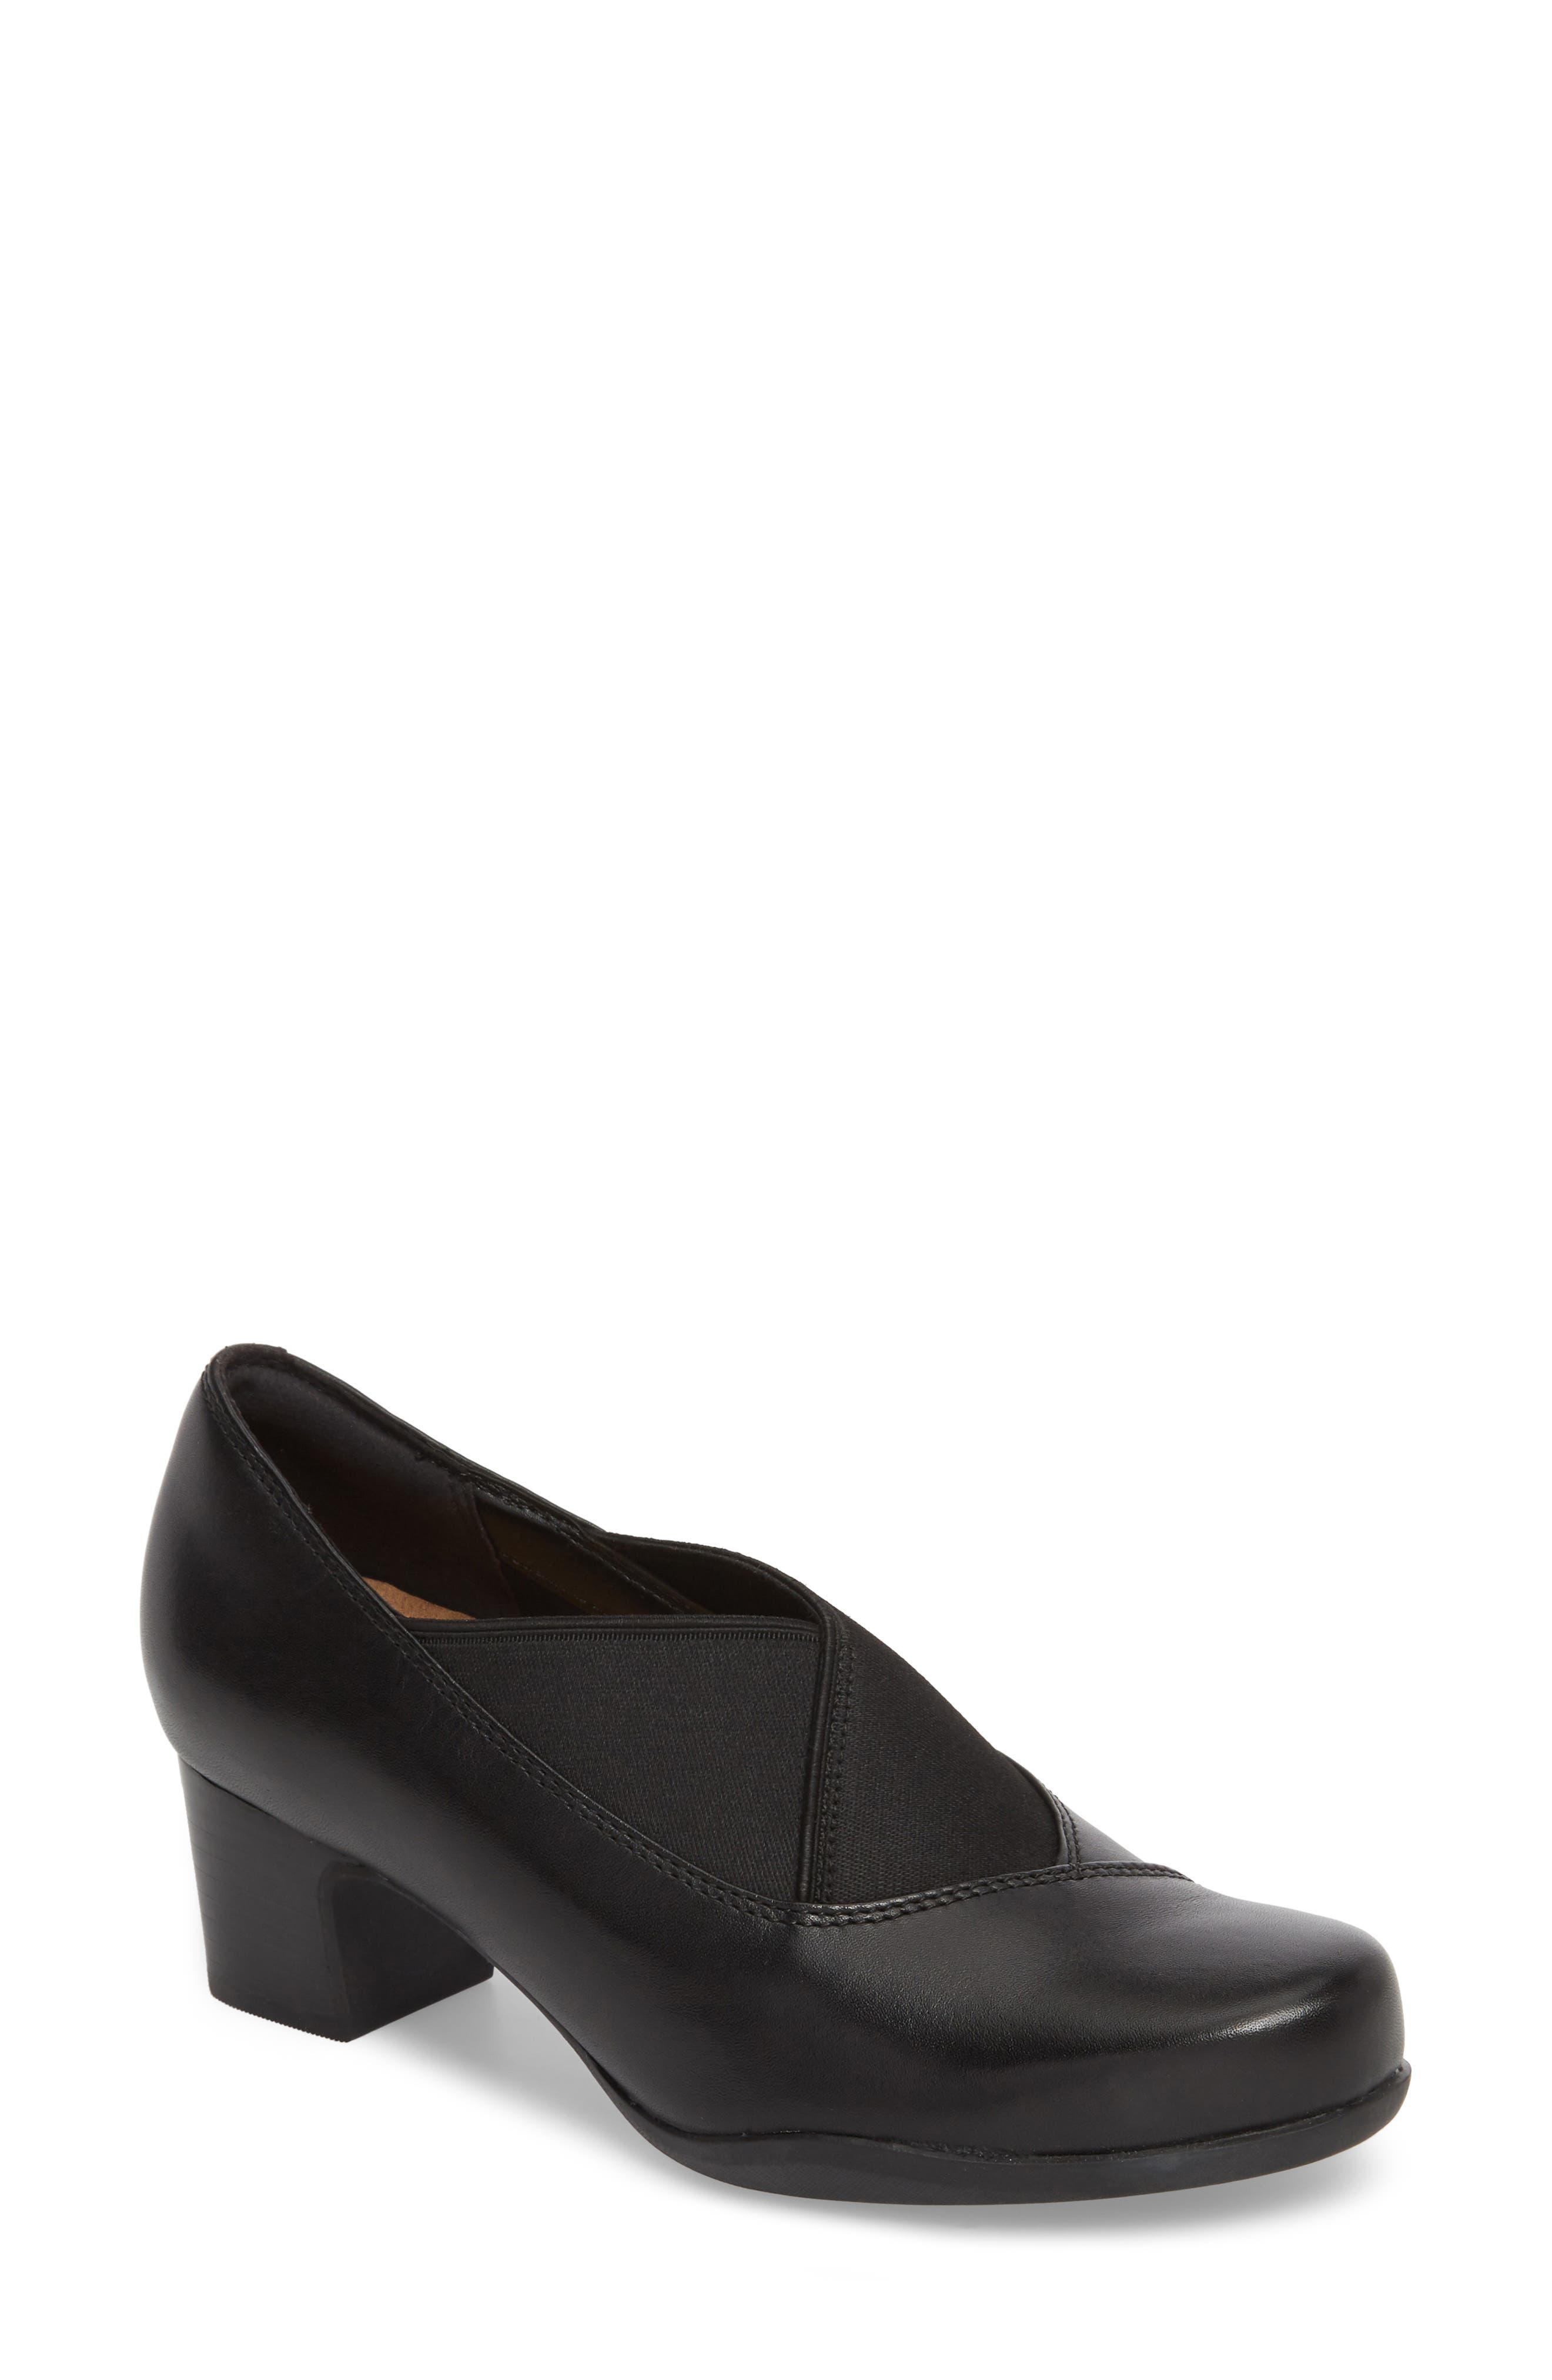 Rosalyn Olivia Pump,                         Main,                         color, Black Leather